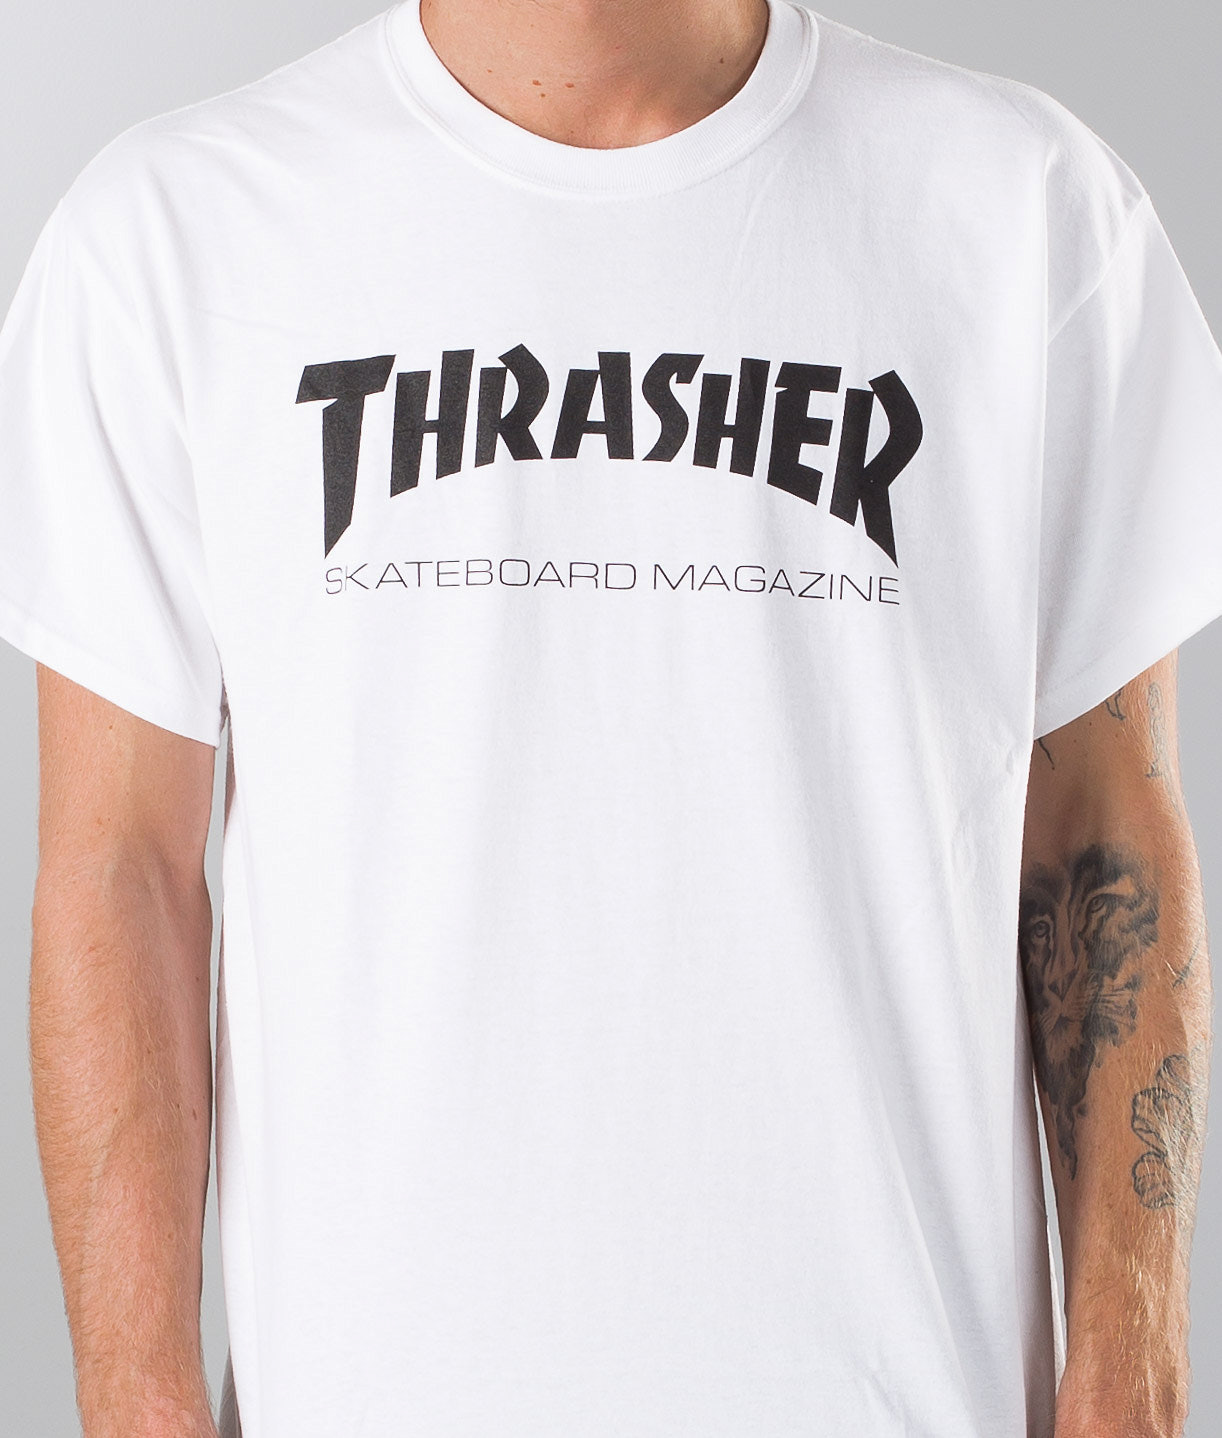 52388a5644 Thrasher Skate Mag T-shirt White - Ridestore.com